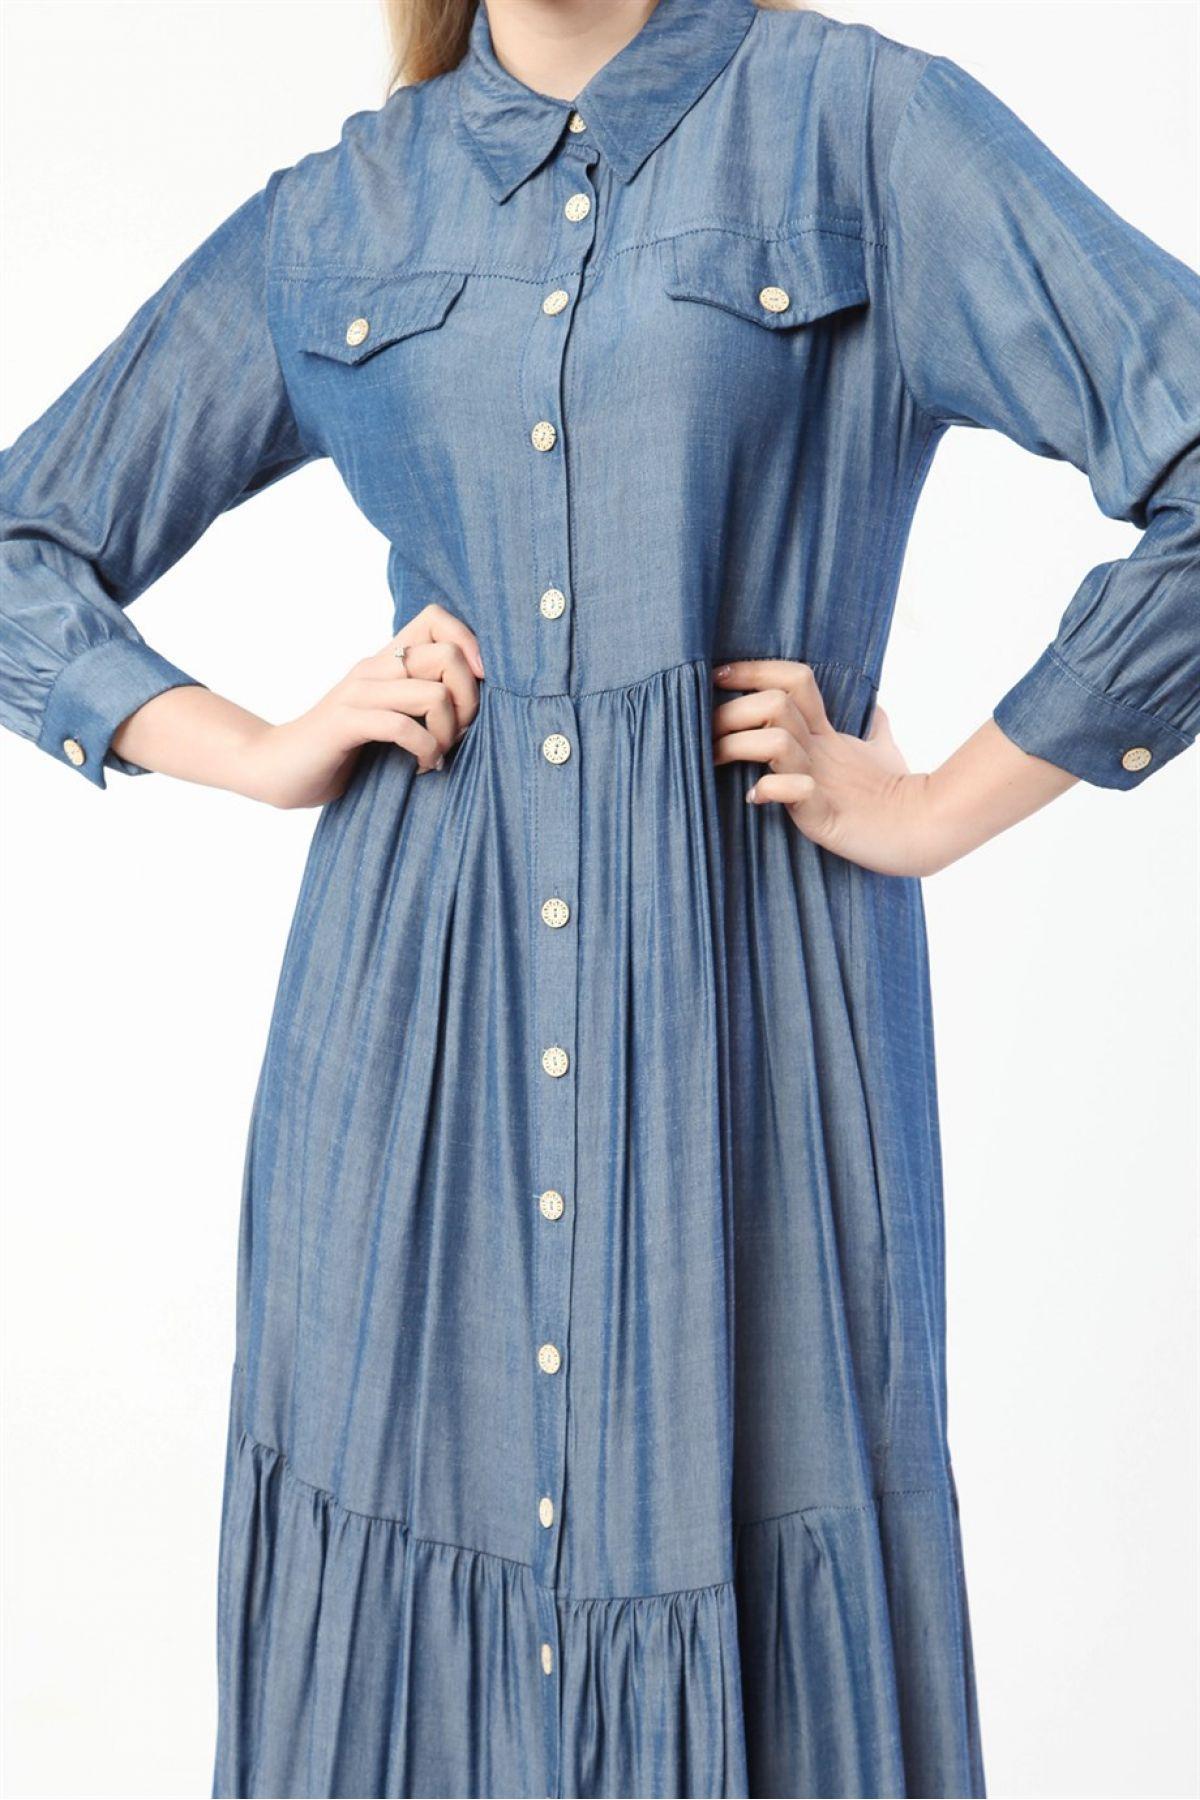 Dresses-Blue